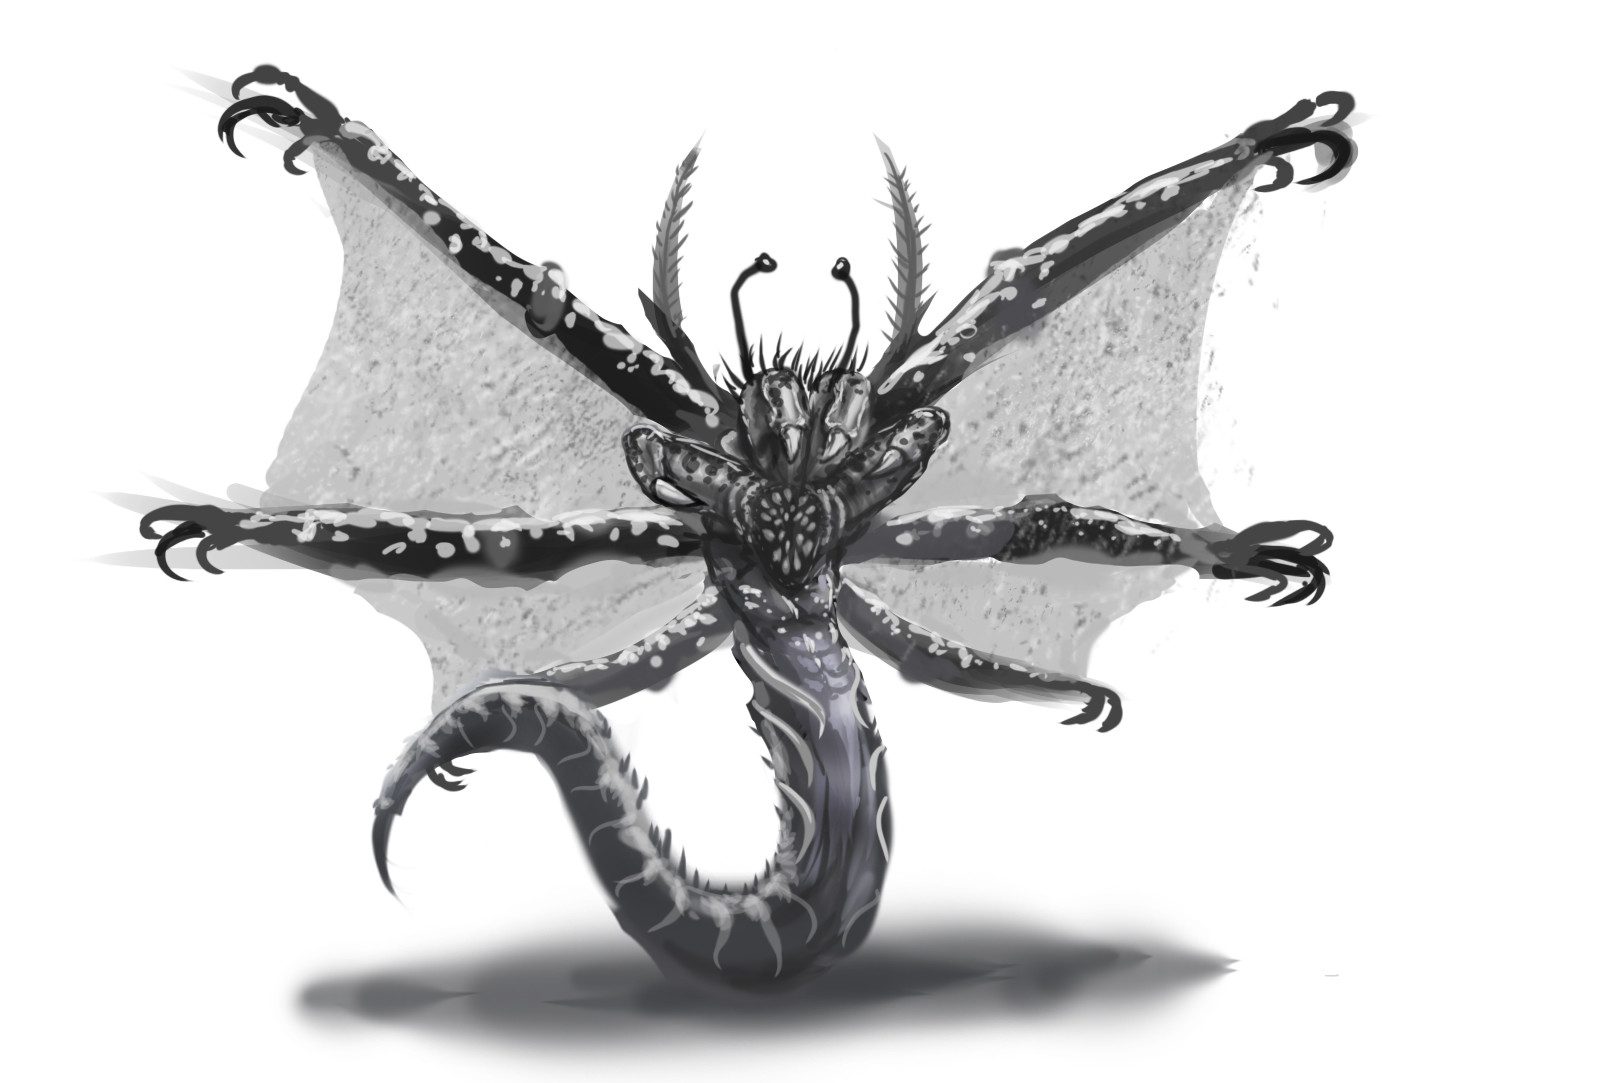 Thorns shine creature 002 2